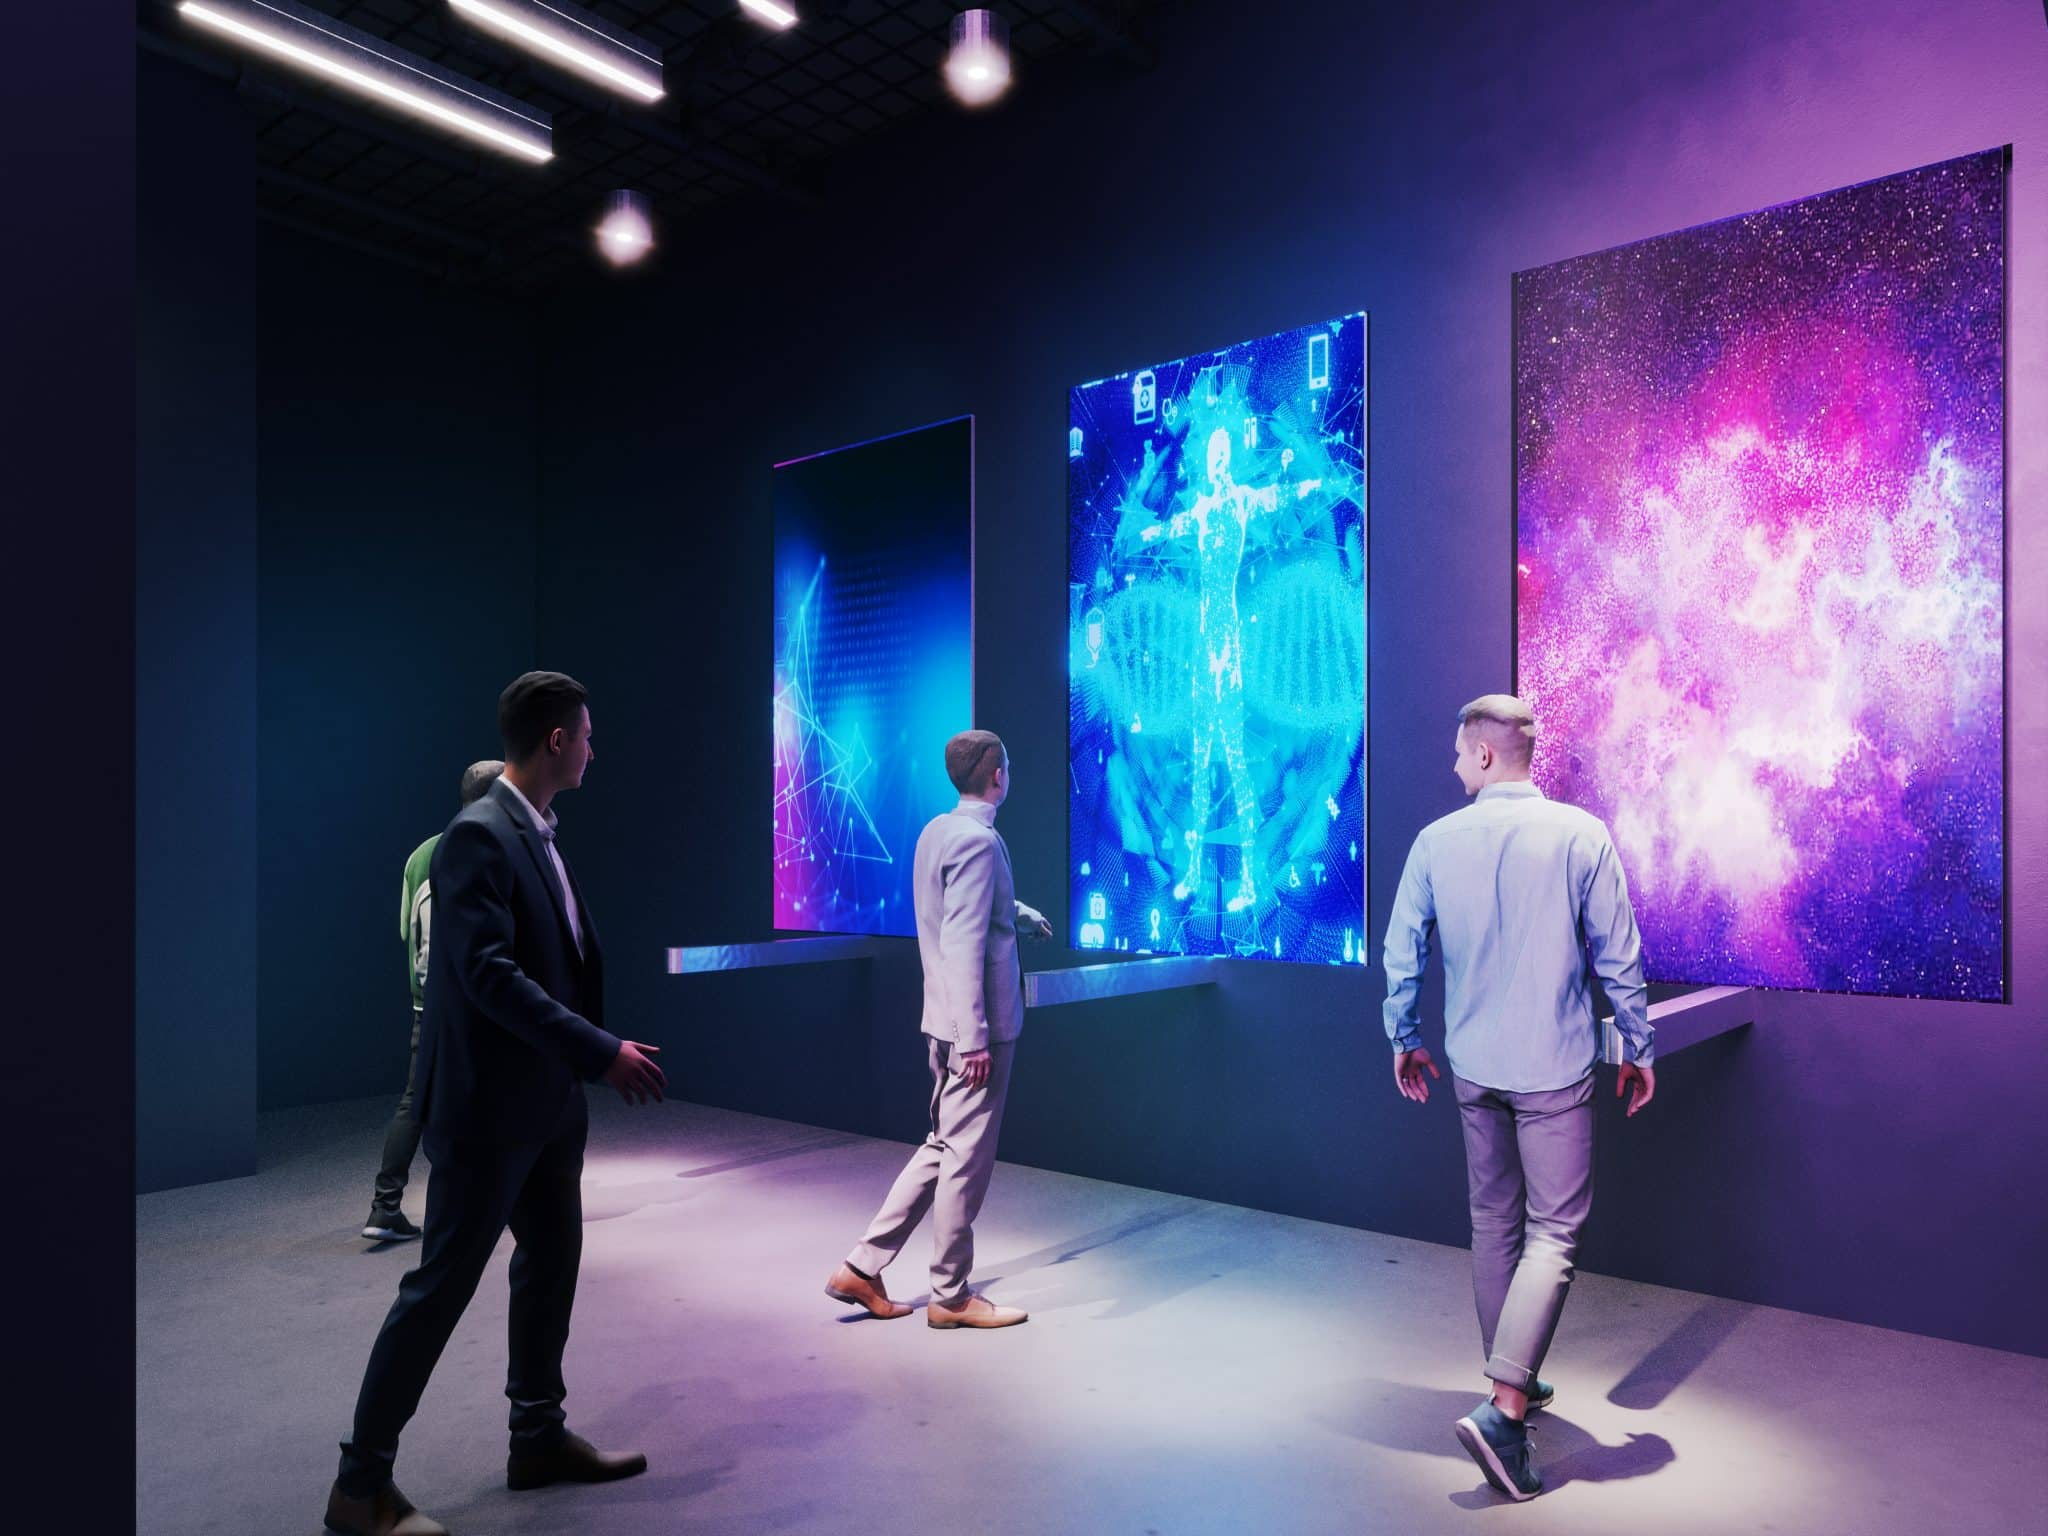 Slovenský pavilón Expo Dubaj 2020 C